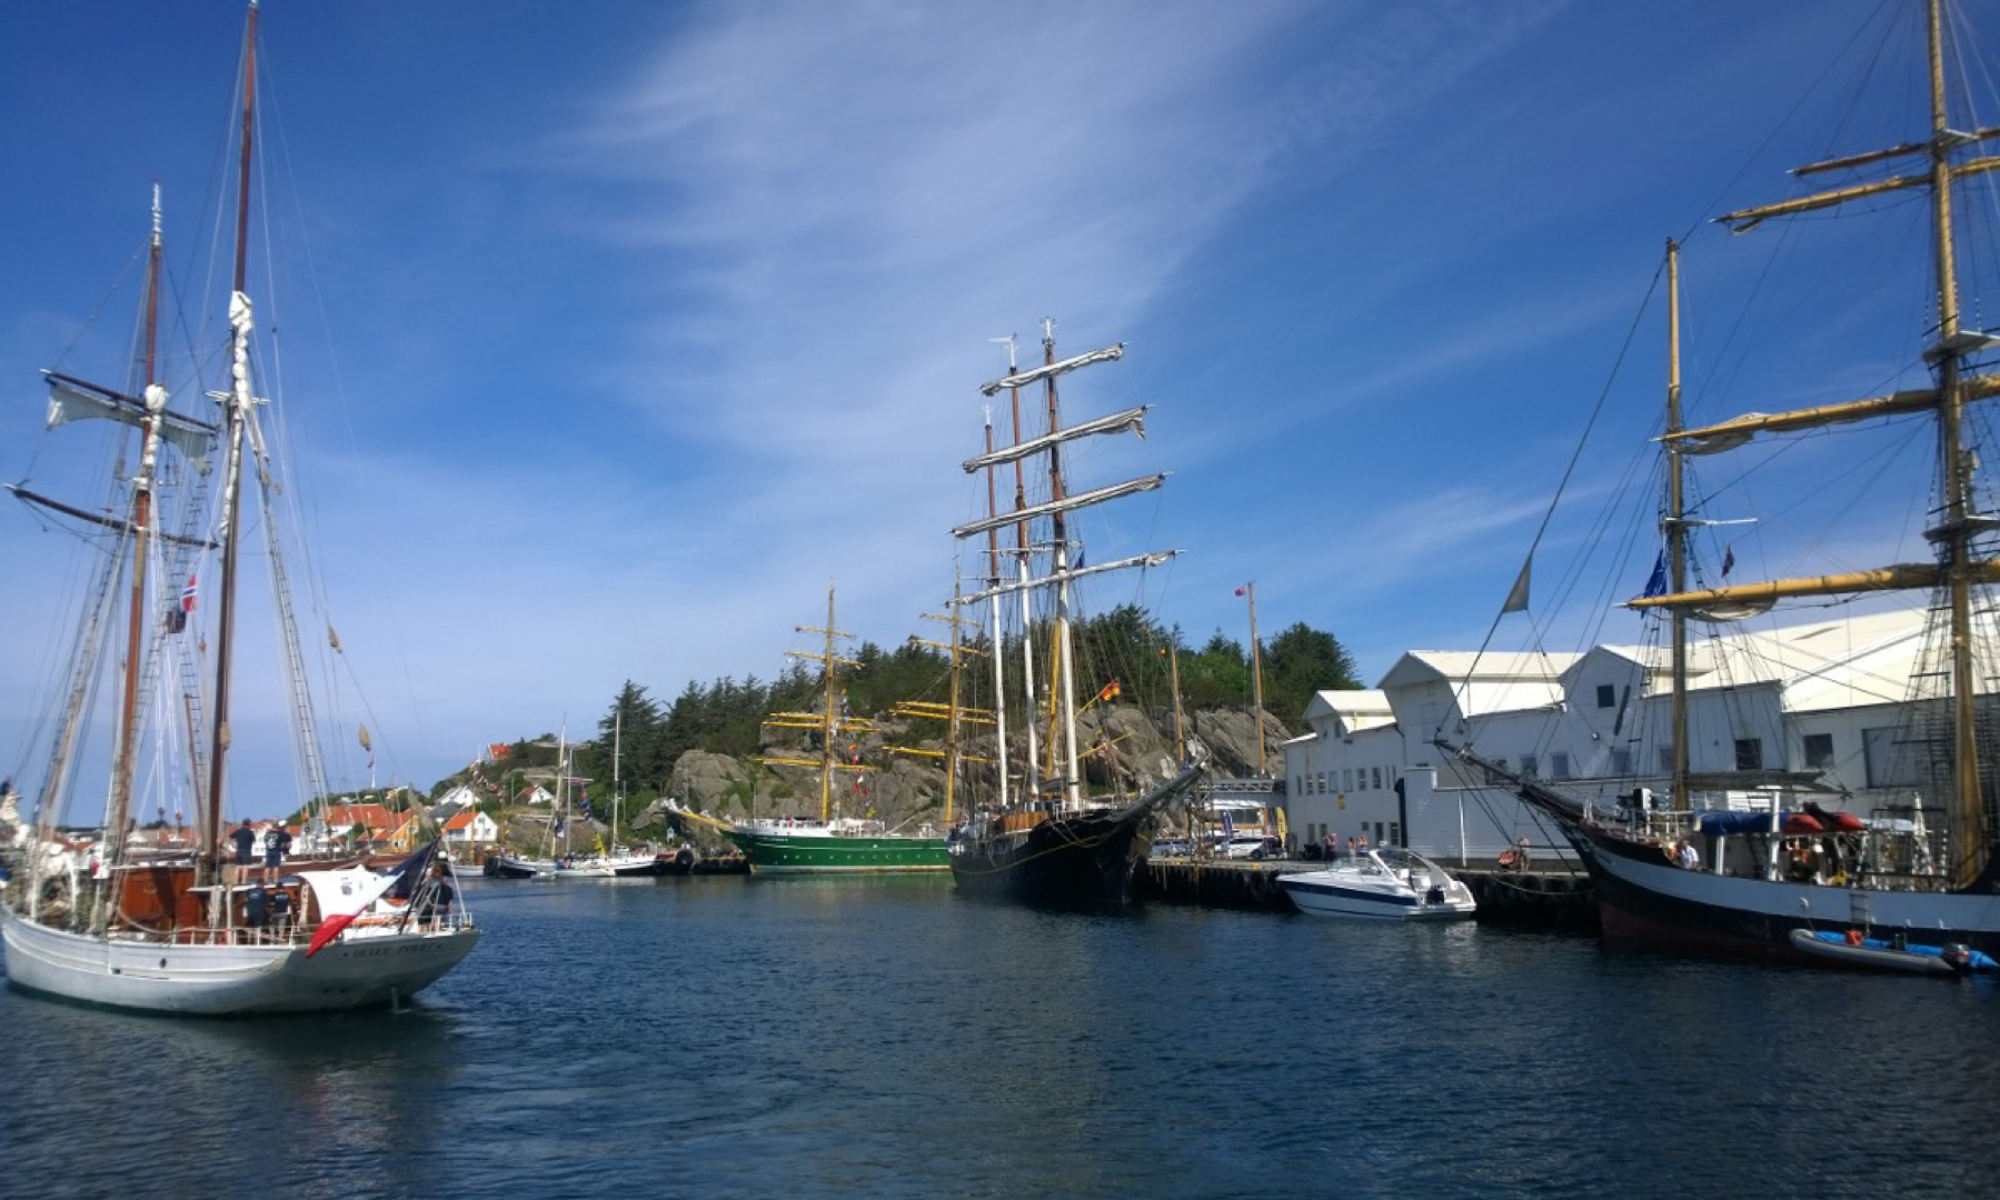 CinC 2018 Skudeneshavn